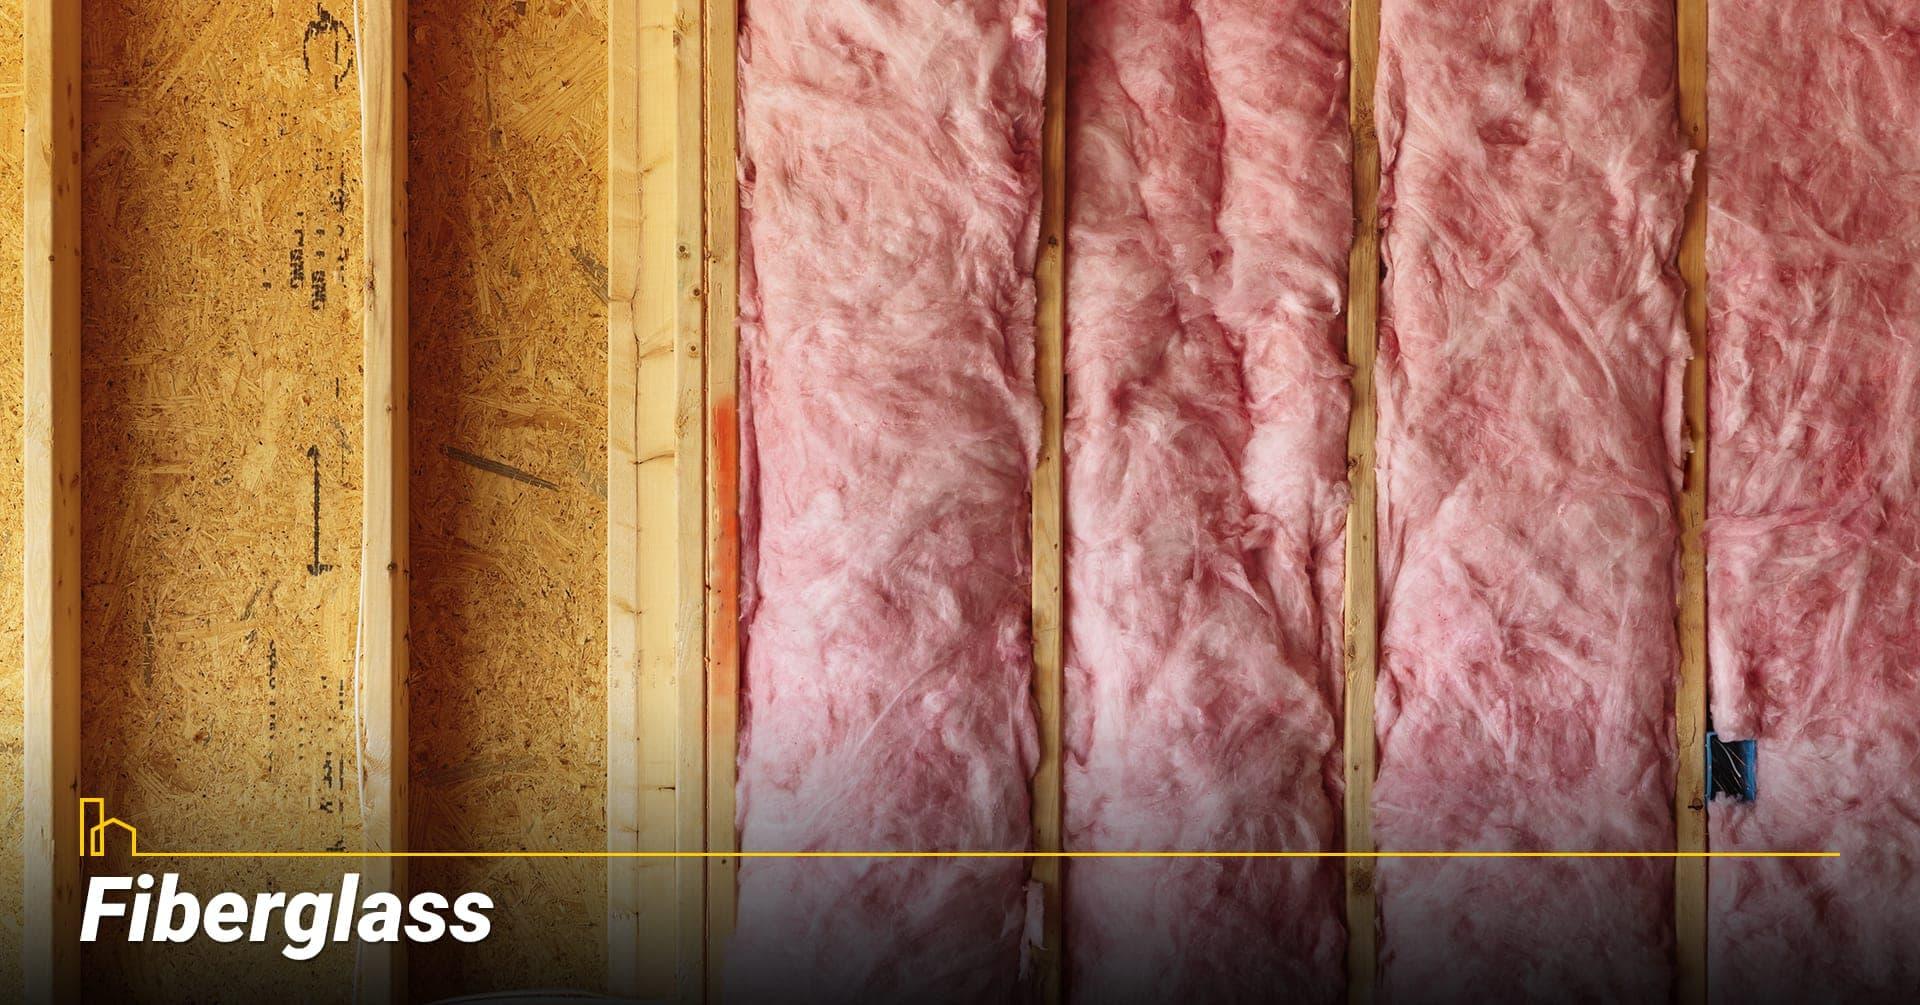 Fiberglass, use fiberglass as insulation